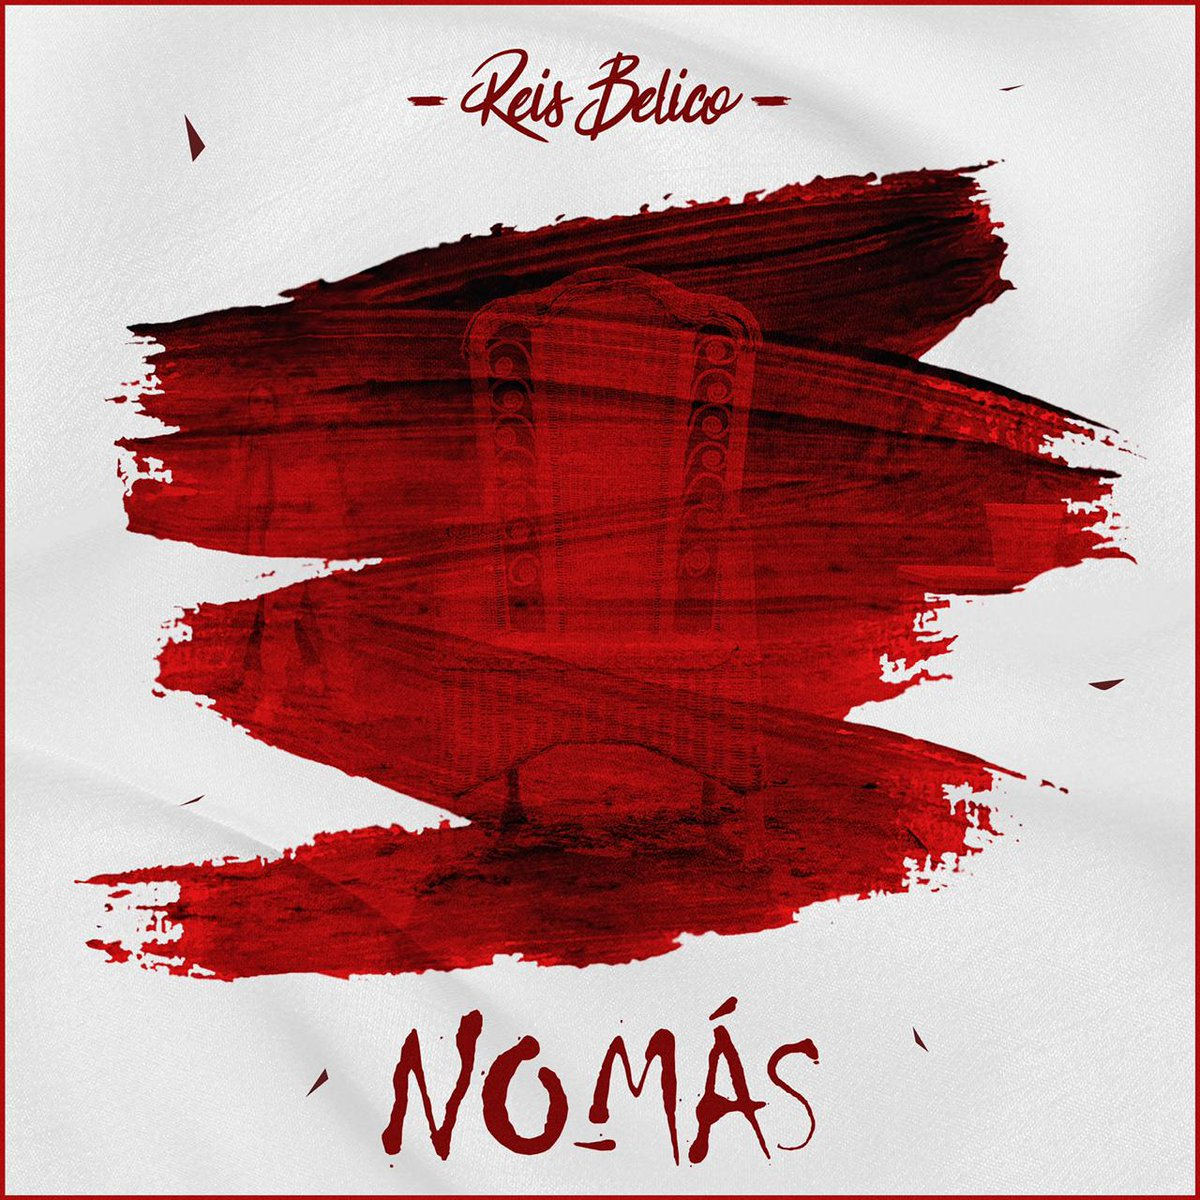 Recuerda que #NoMás  esta disponible en #Spotify #Deezer #Itunes #AppleMusic #YoutubeMusic #ReisBélico #EscoRecords #Venezuela #Colombia #ProducciónMusical #Musica   http://bit.ly/37LaZEnpic.twitter.com/O0Ku5m5vdD